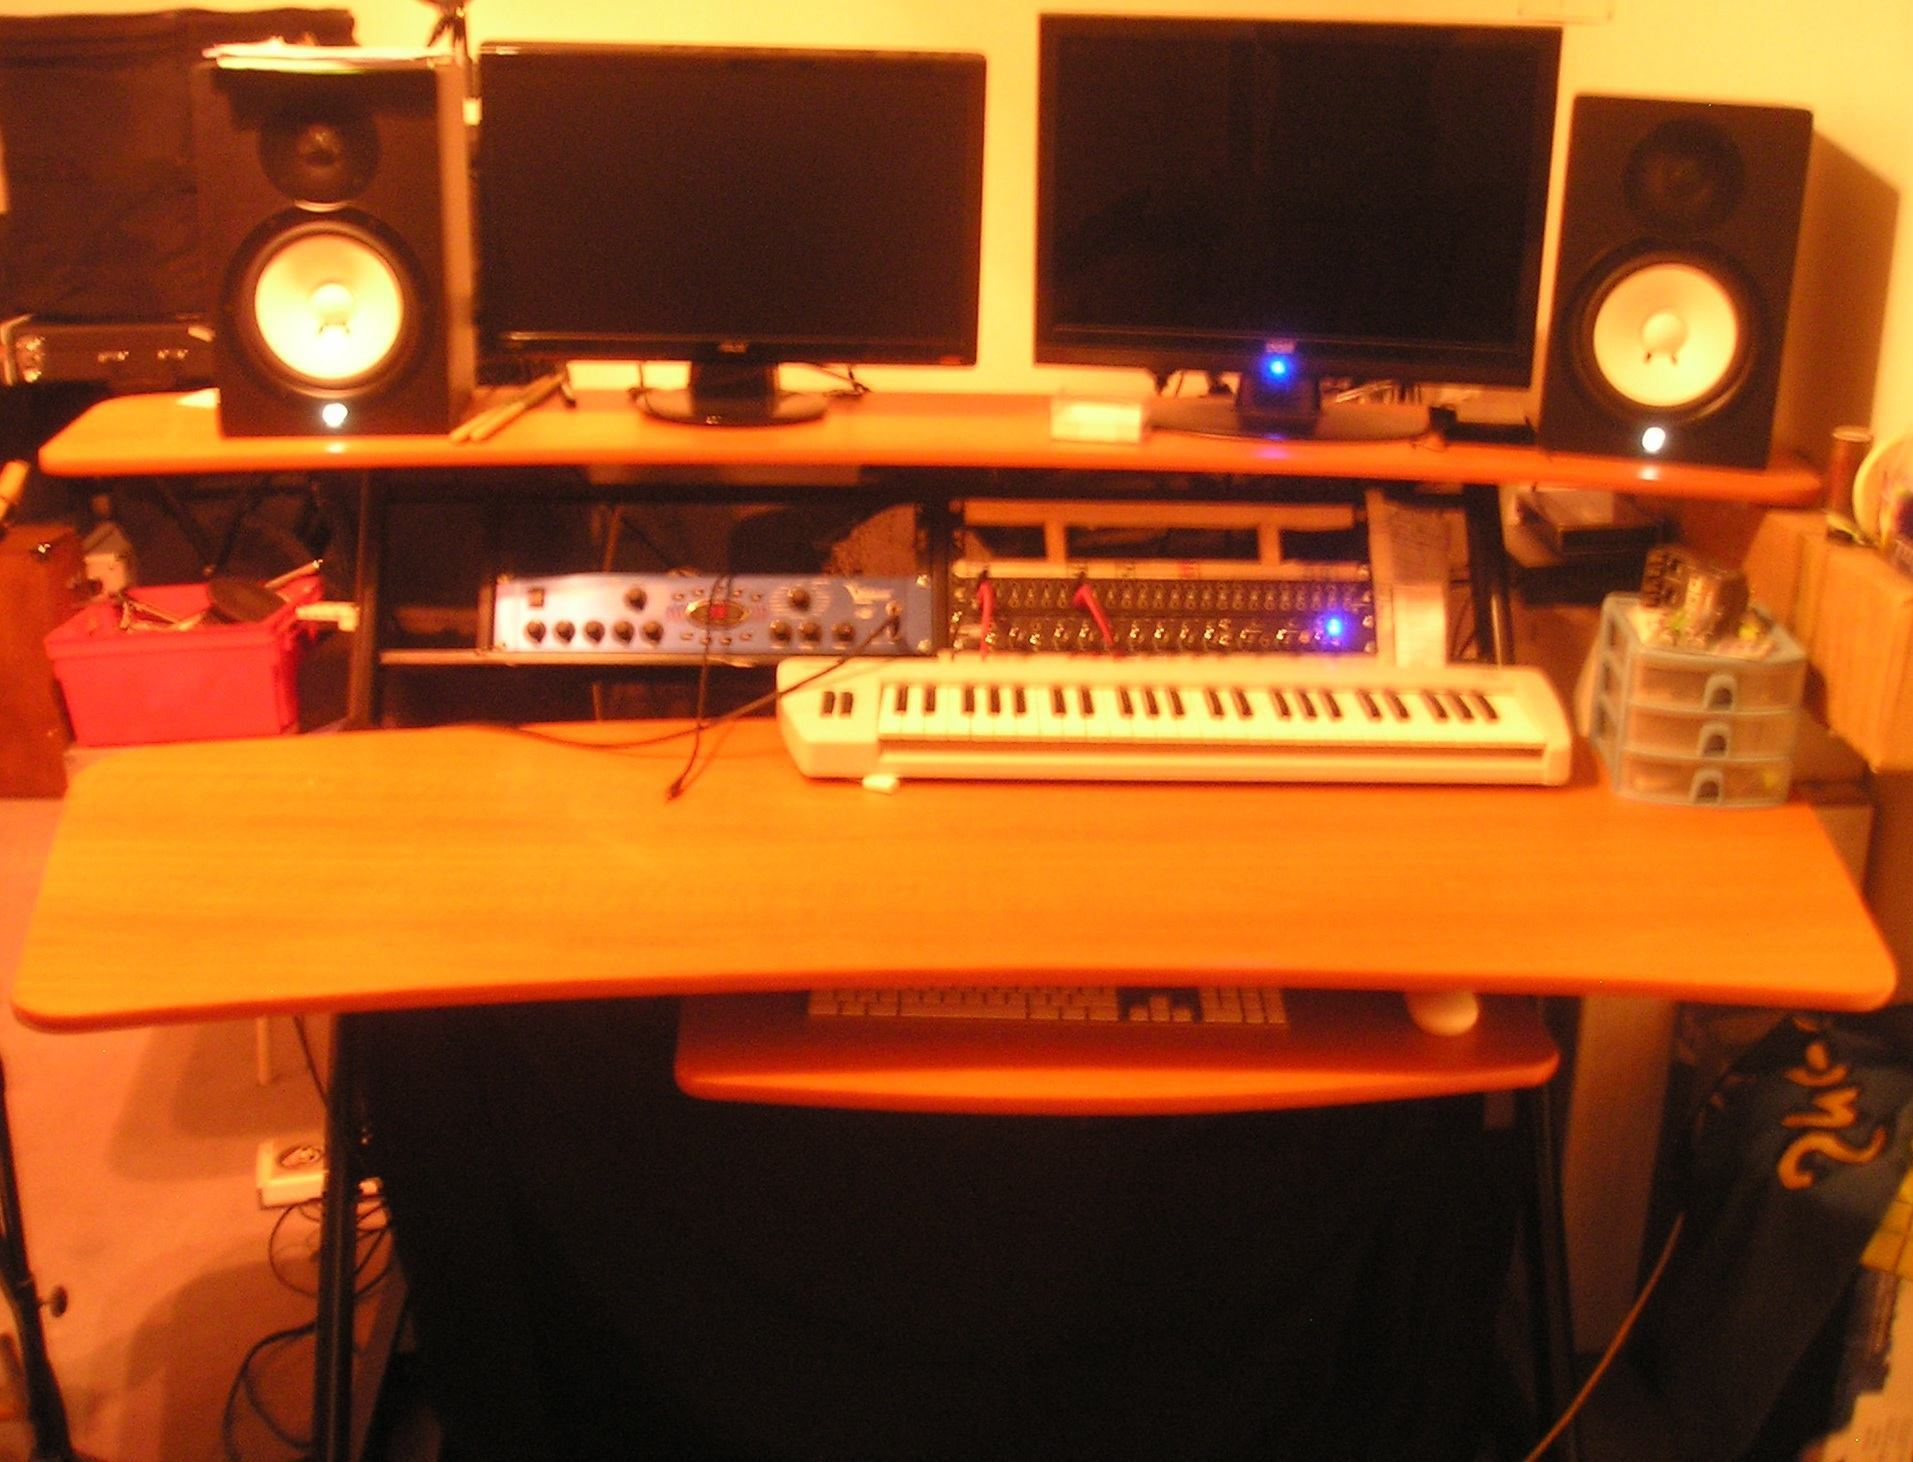 Fame W 200 Studio Workstation image Audiofanzine